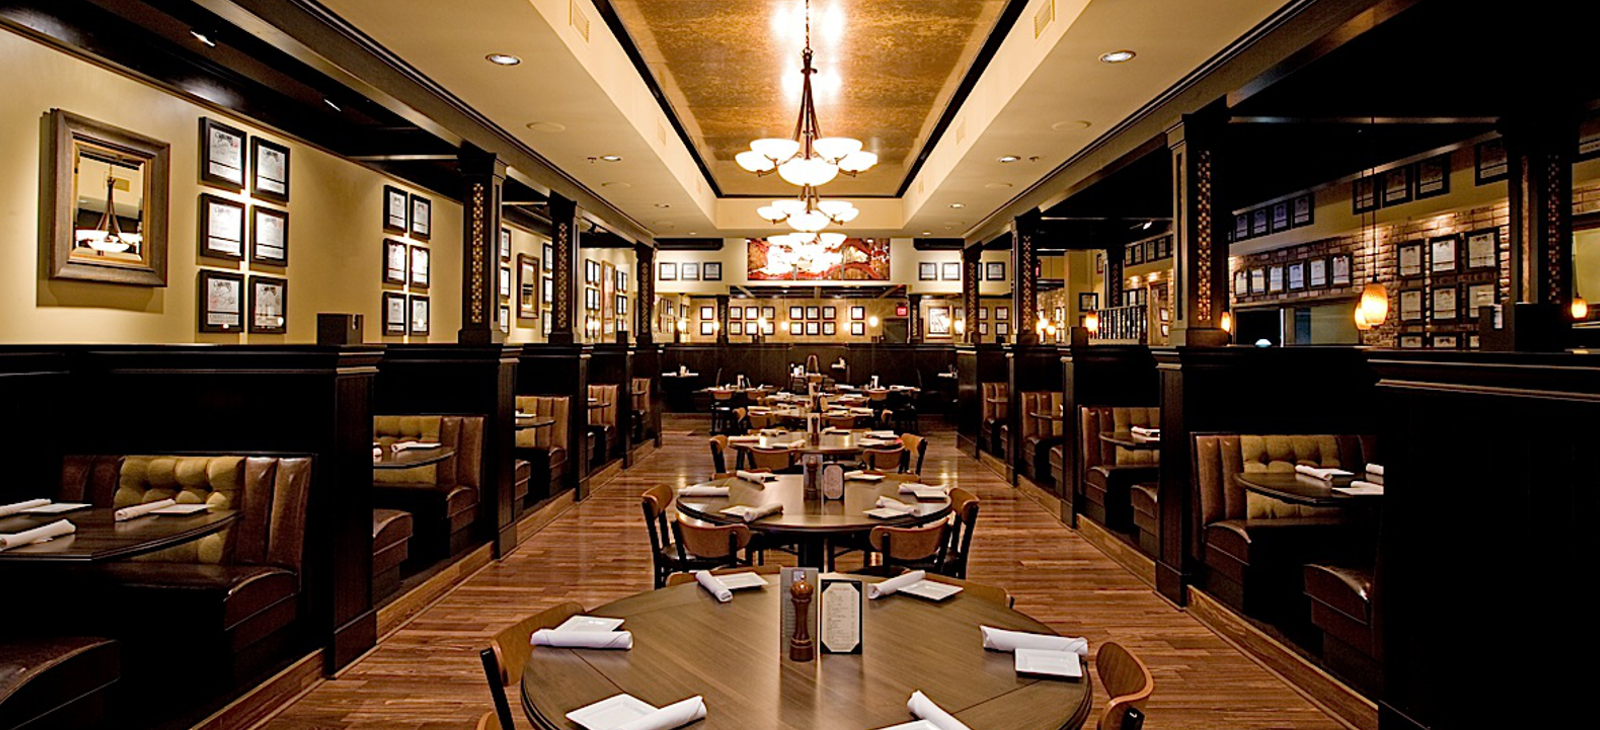 Dinner Restaurants Lexington Ky